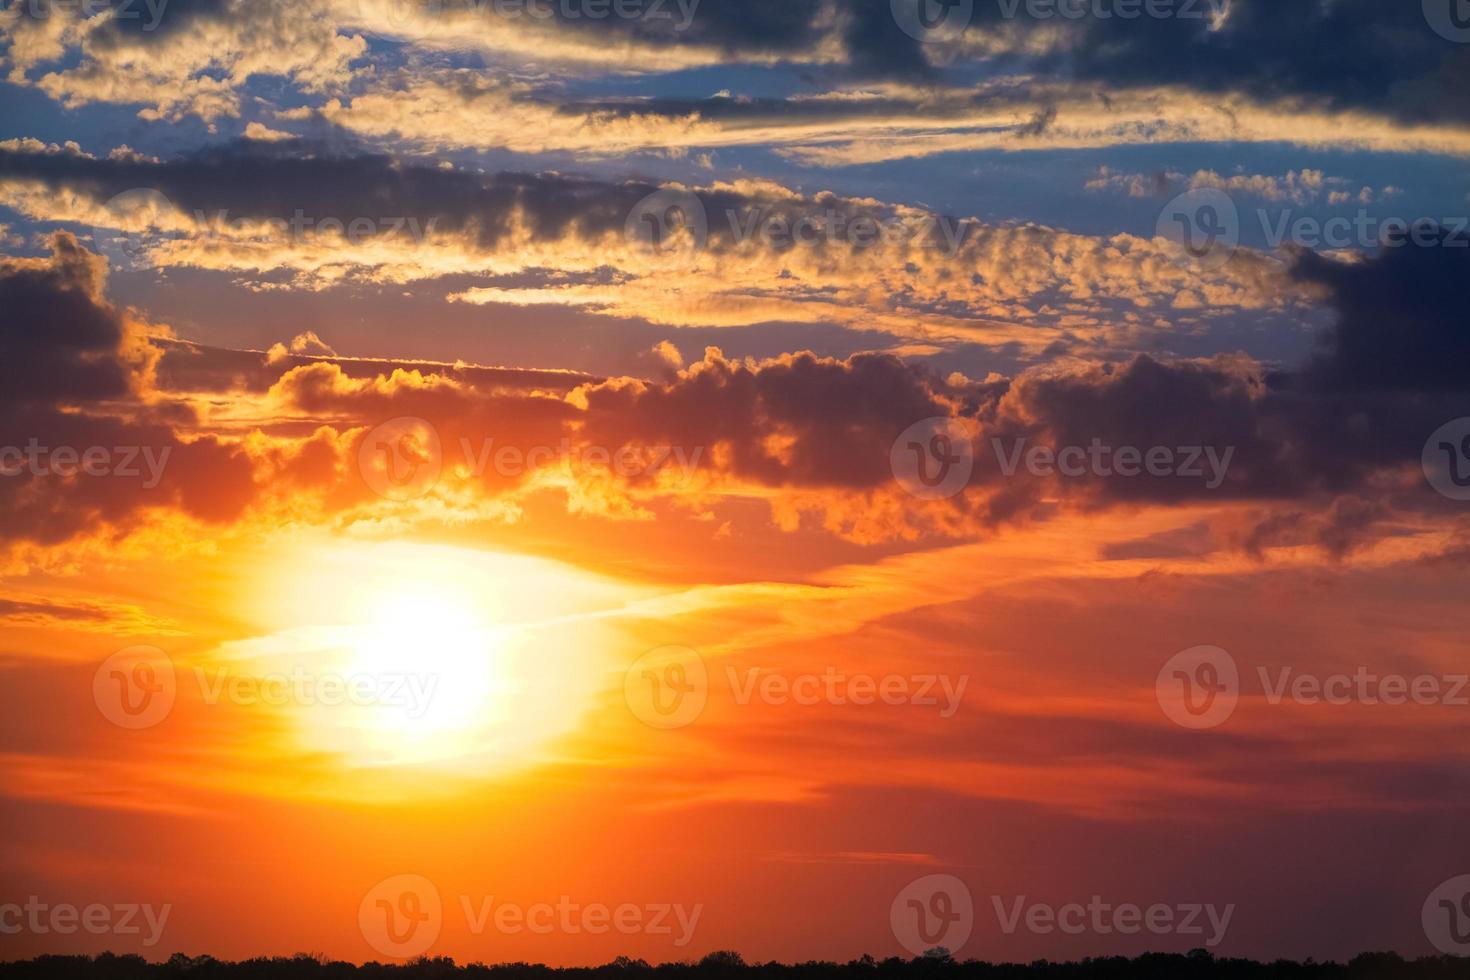 tramonto infuocato. bel cielo. foto